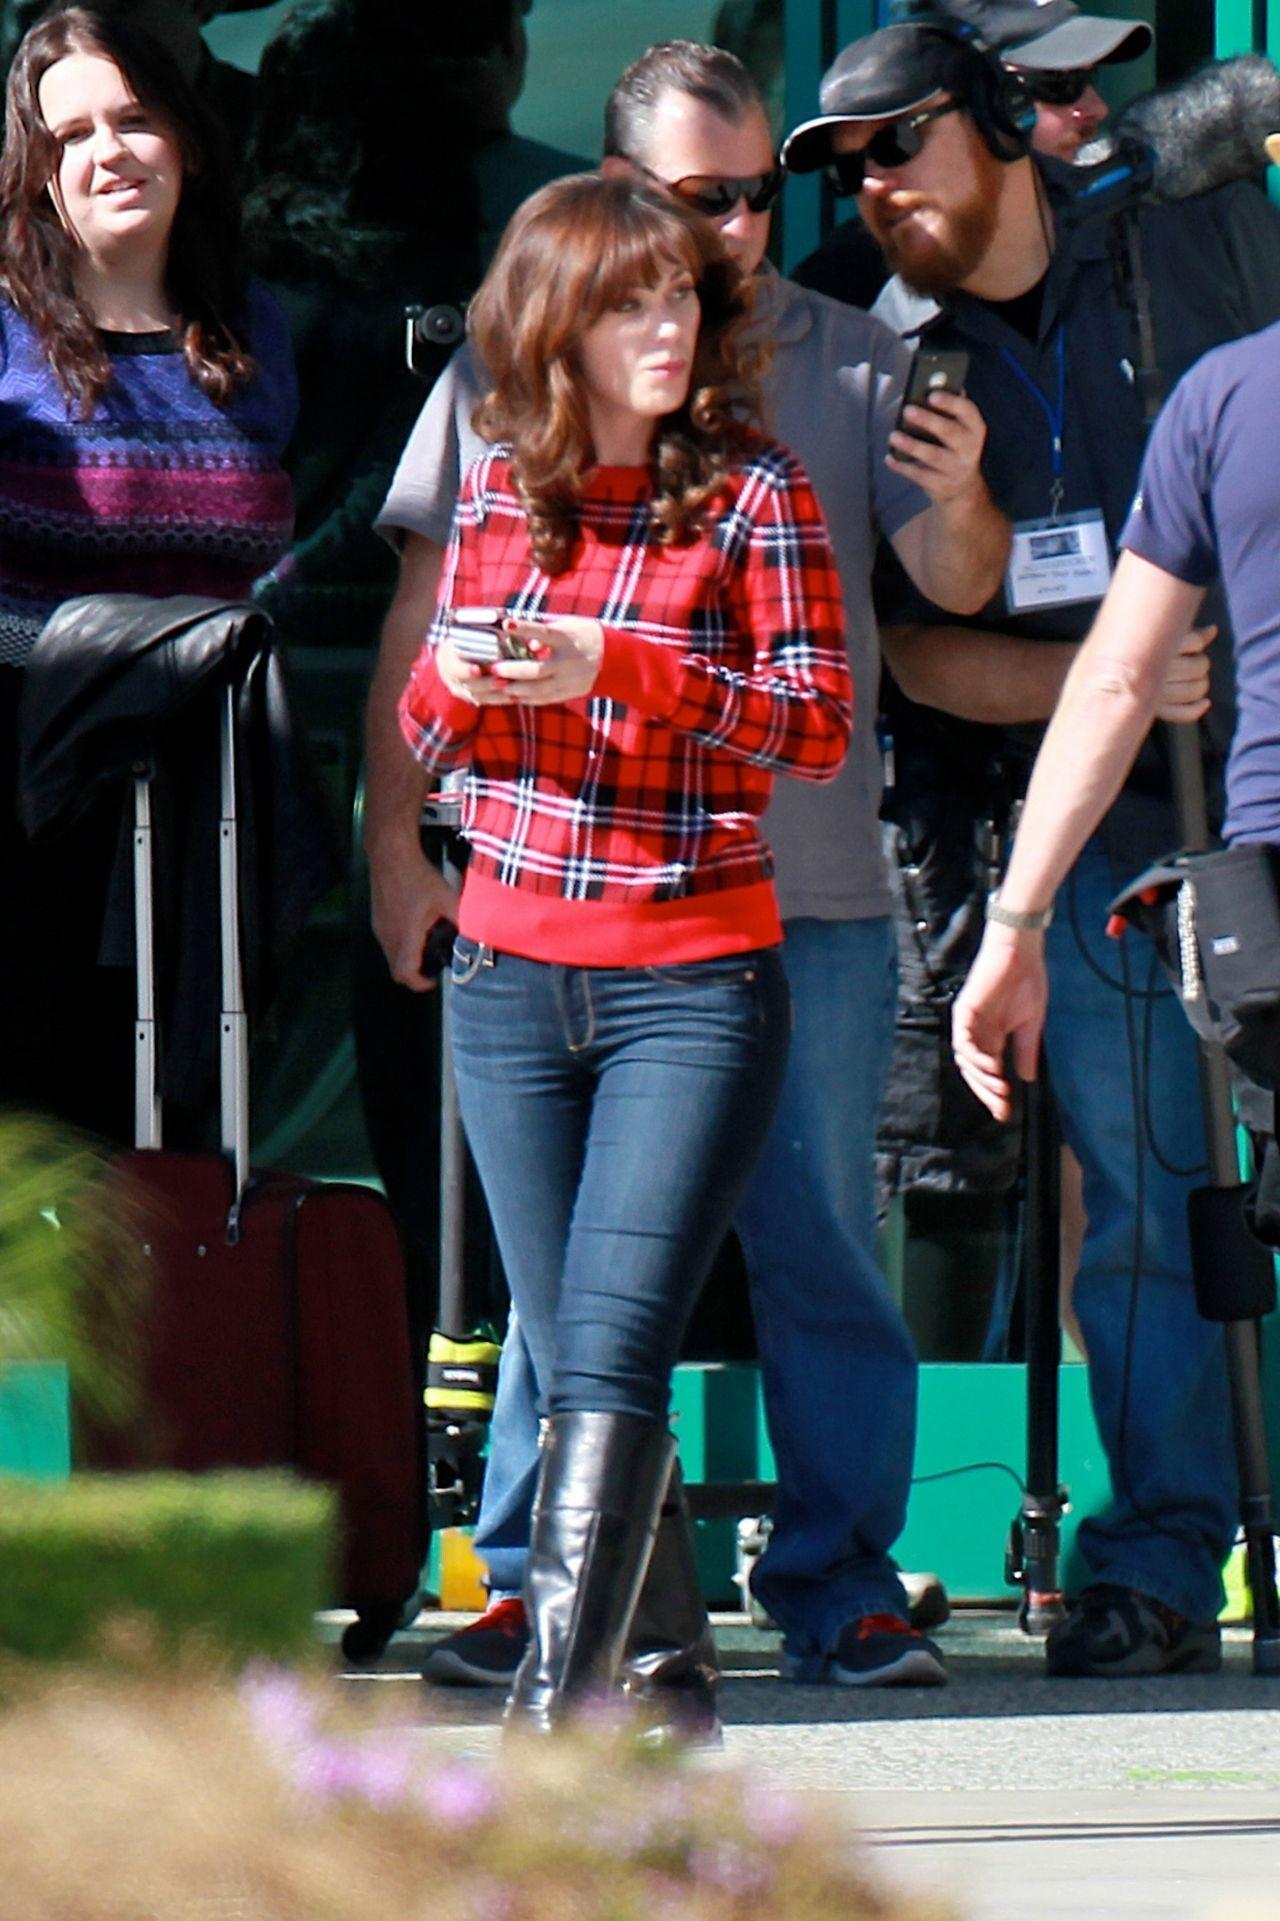 Zooey Deschanel New Girl Set Photos Los Angeles Nov